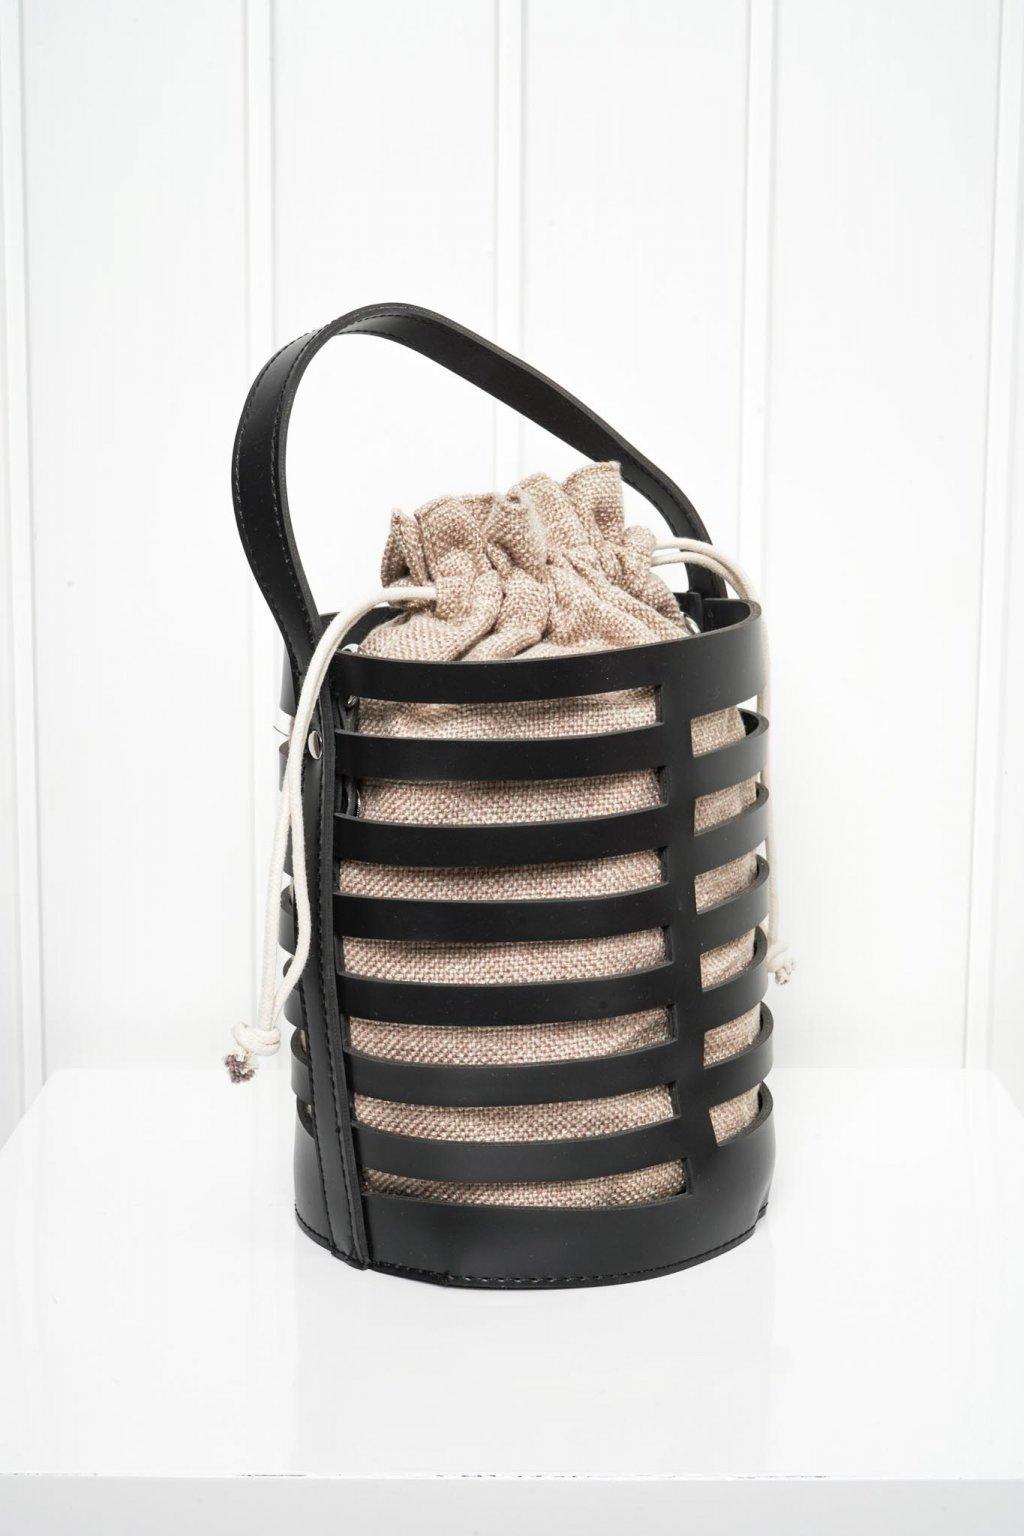 Kabelka, crossbody, ruksak, shopping bag, shopperka, 293